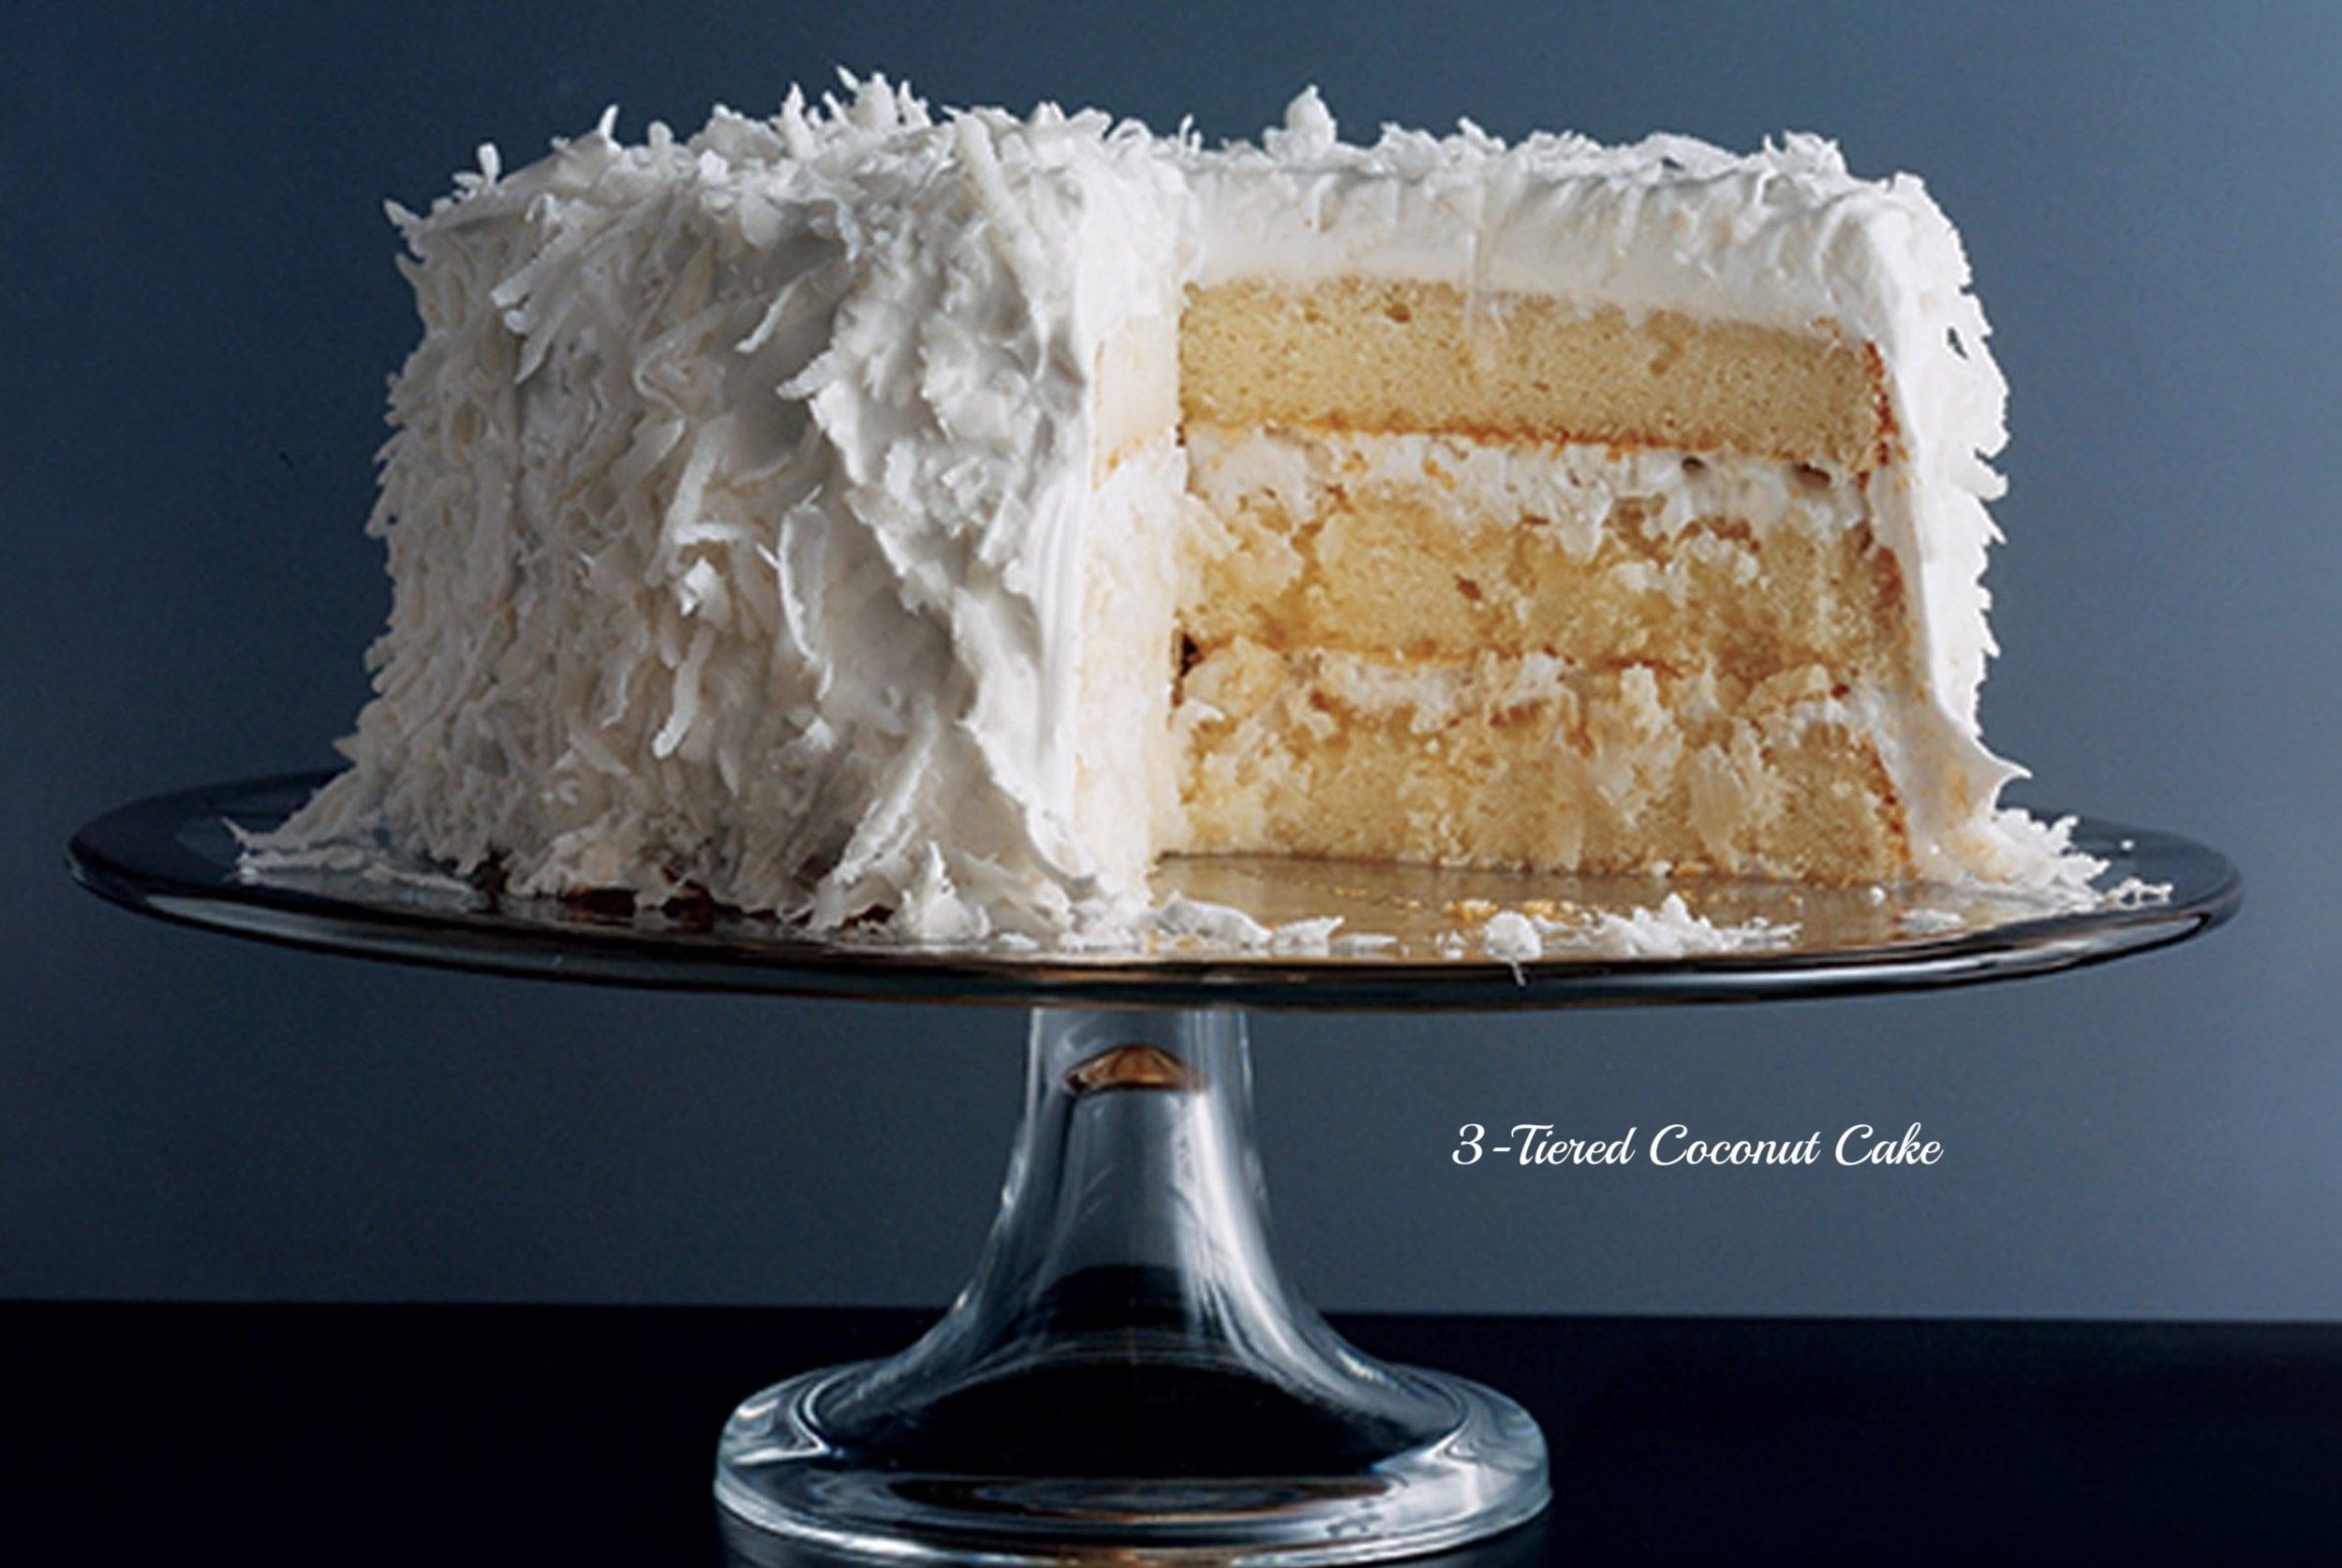 3-Tiered Coconut Cake.jpeg